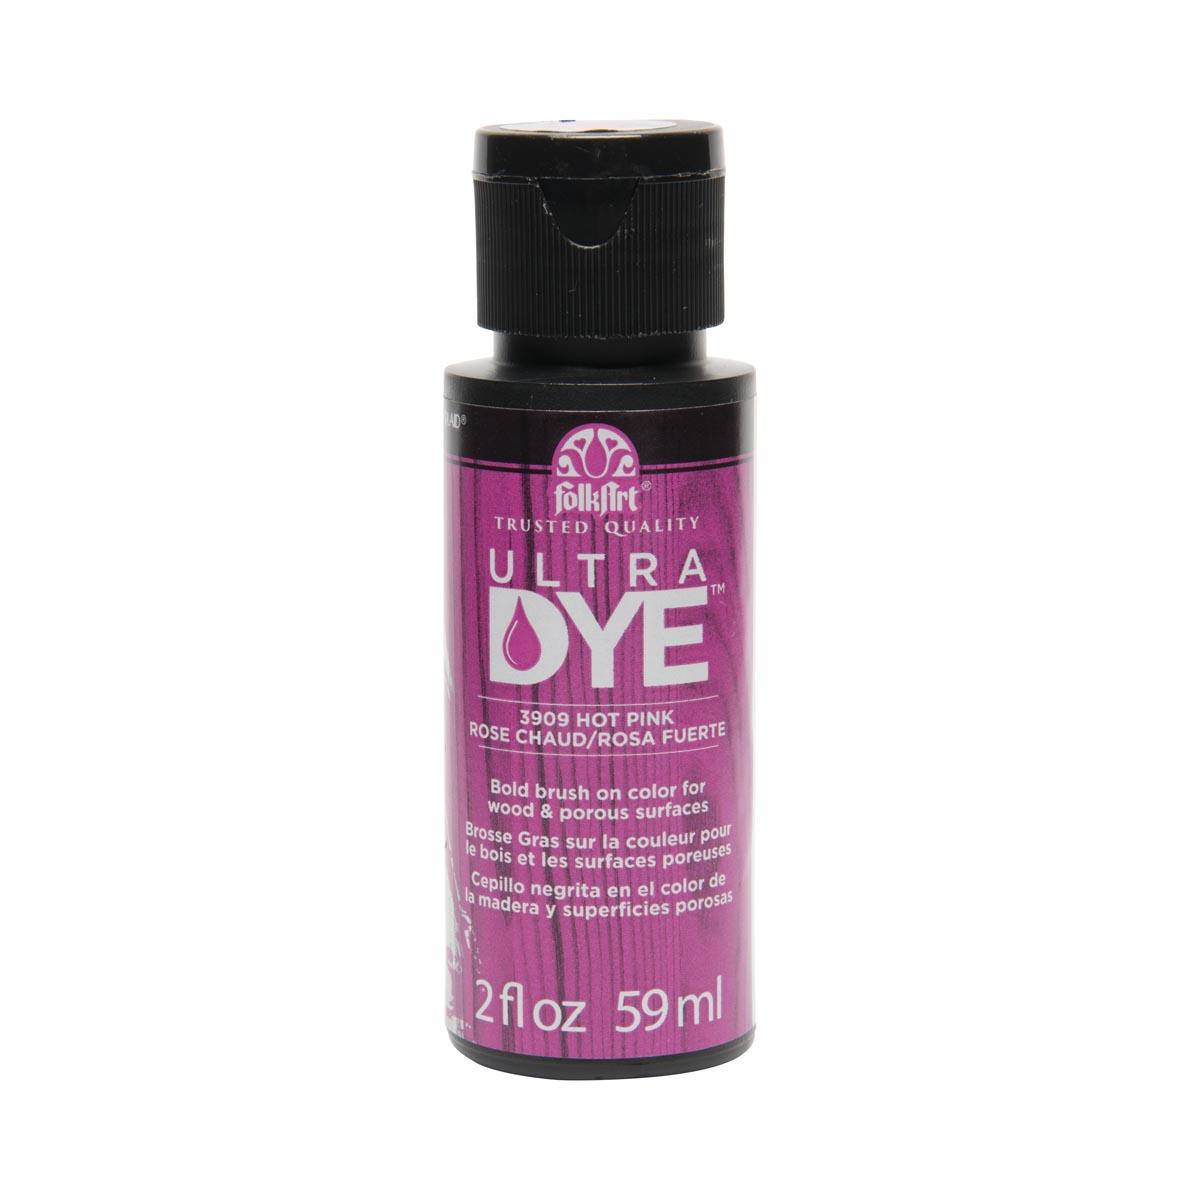 FolkArt ® Ultra Dye™ Colors - Hot Pink, 2 oz. - 3909